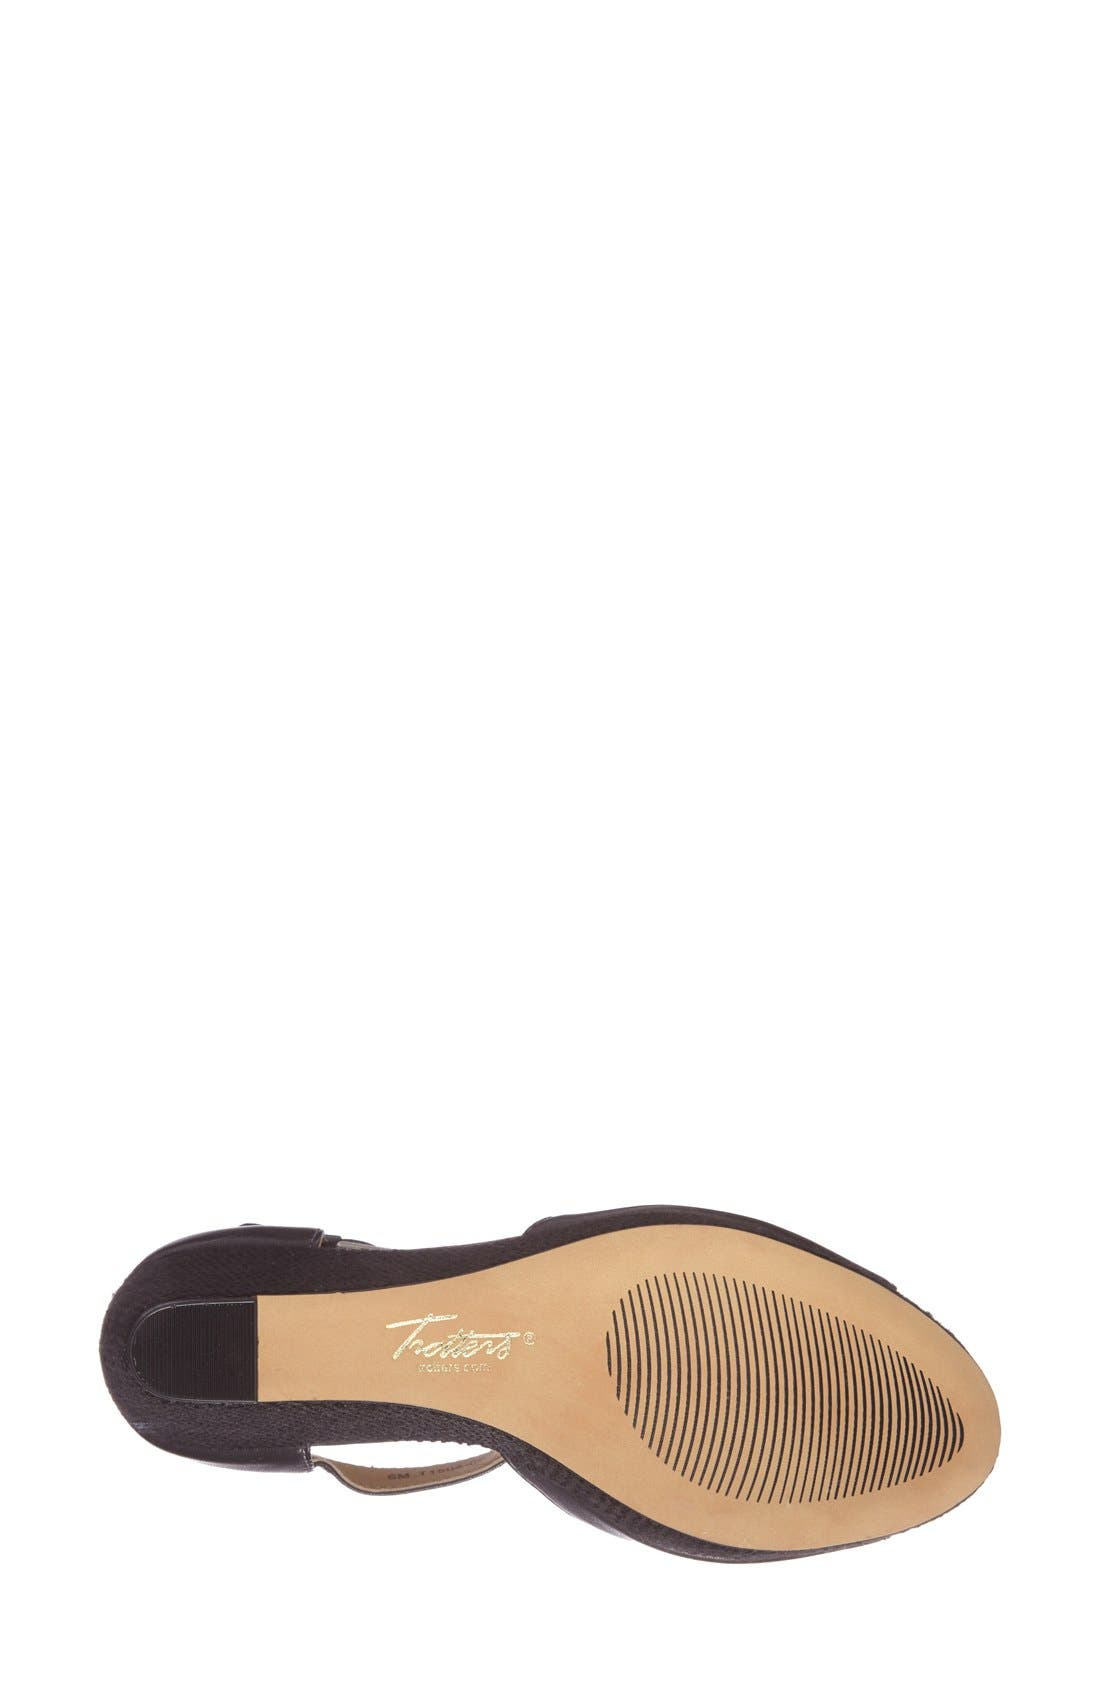 Alternate Image 4  - Trotters 'Amber' Wedge Sandal (Women)